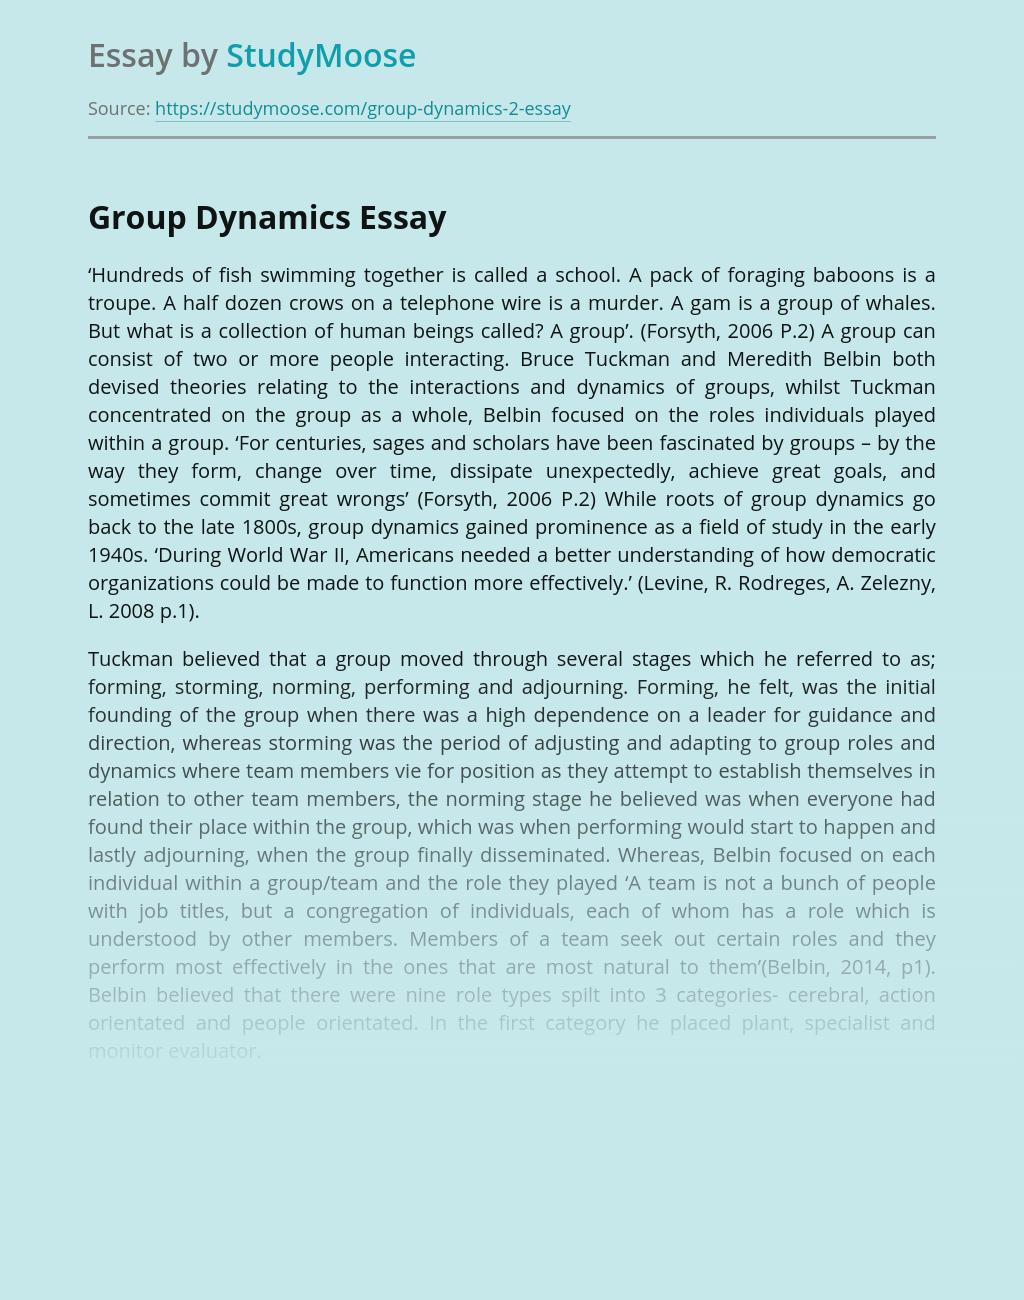 Tuckman's Teamwork Survey and Group Dynamics